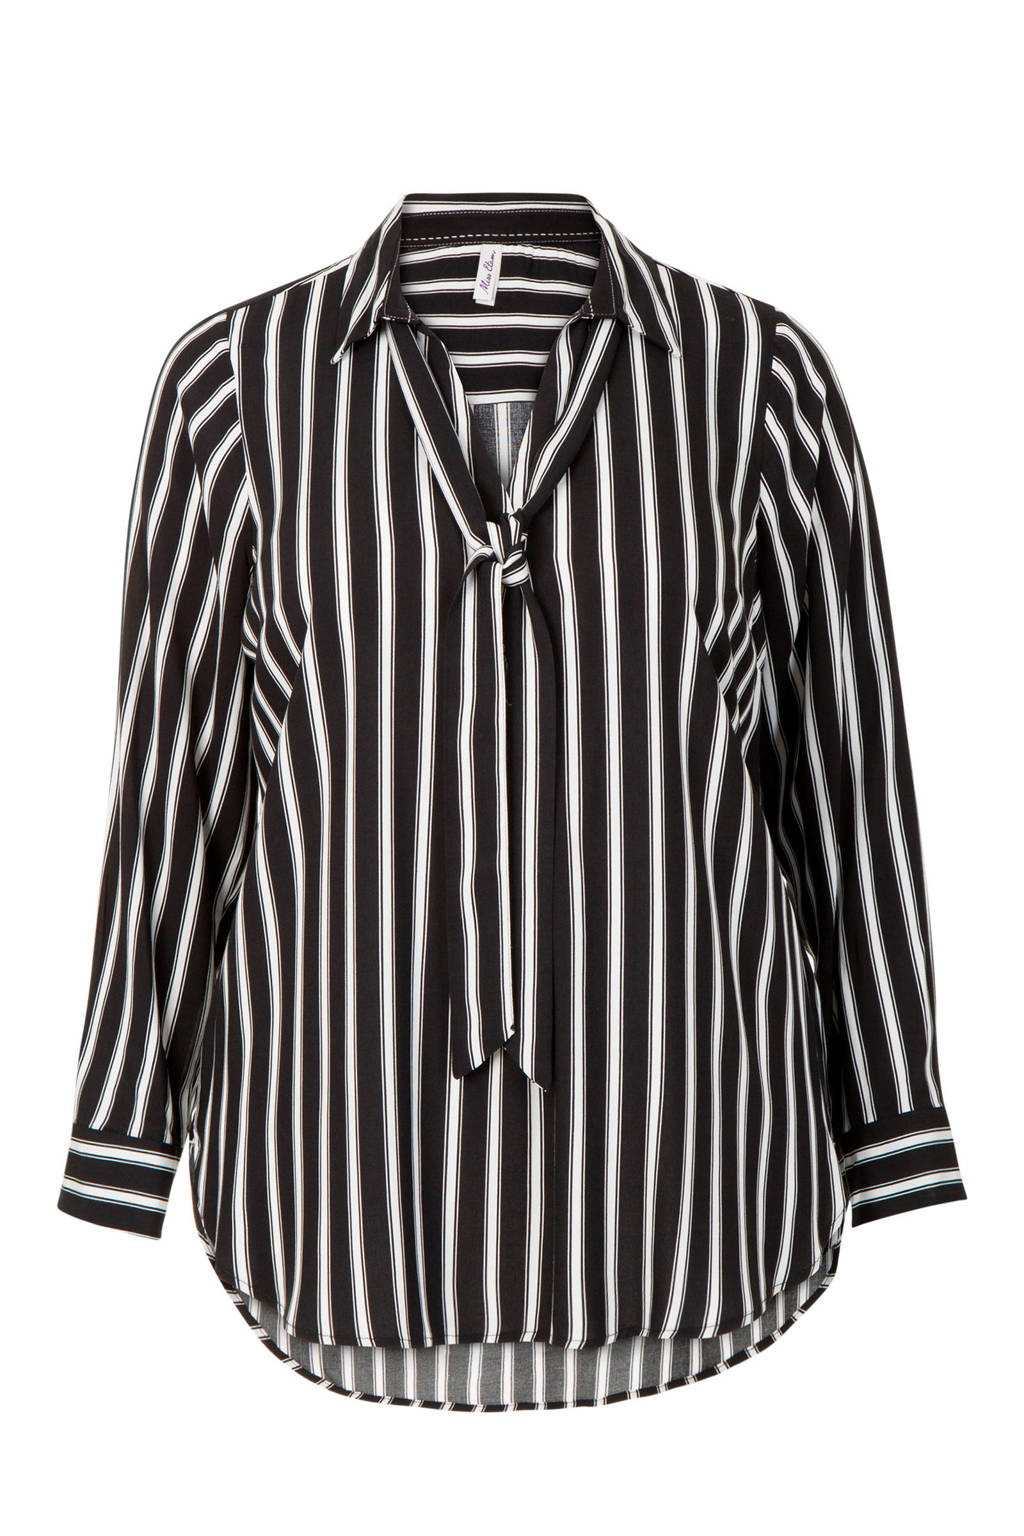 Miss Etam Plus blouse met strepen zwart, Zwart